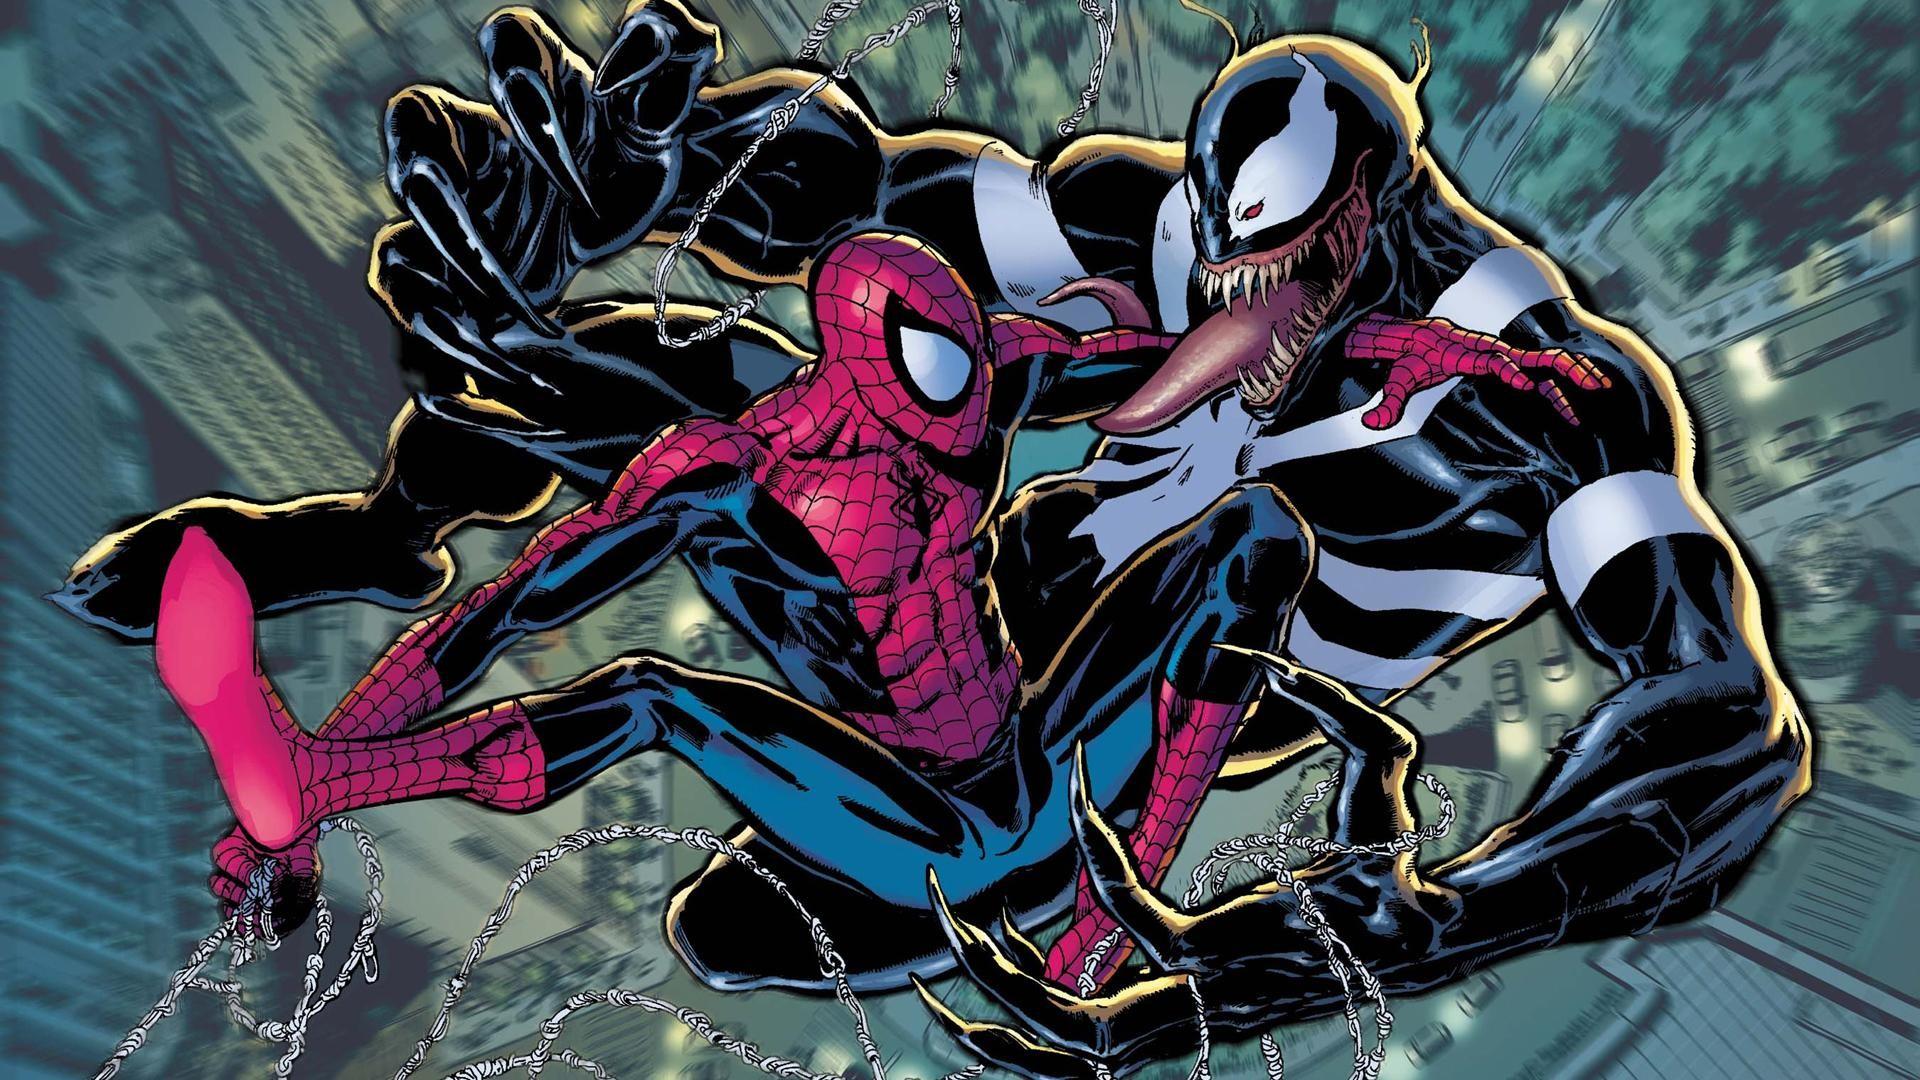 Spiderman cartoon wallpaper 75 images - Spider man 3 wallpaper 1080p ...